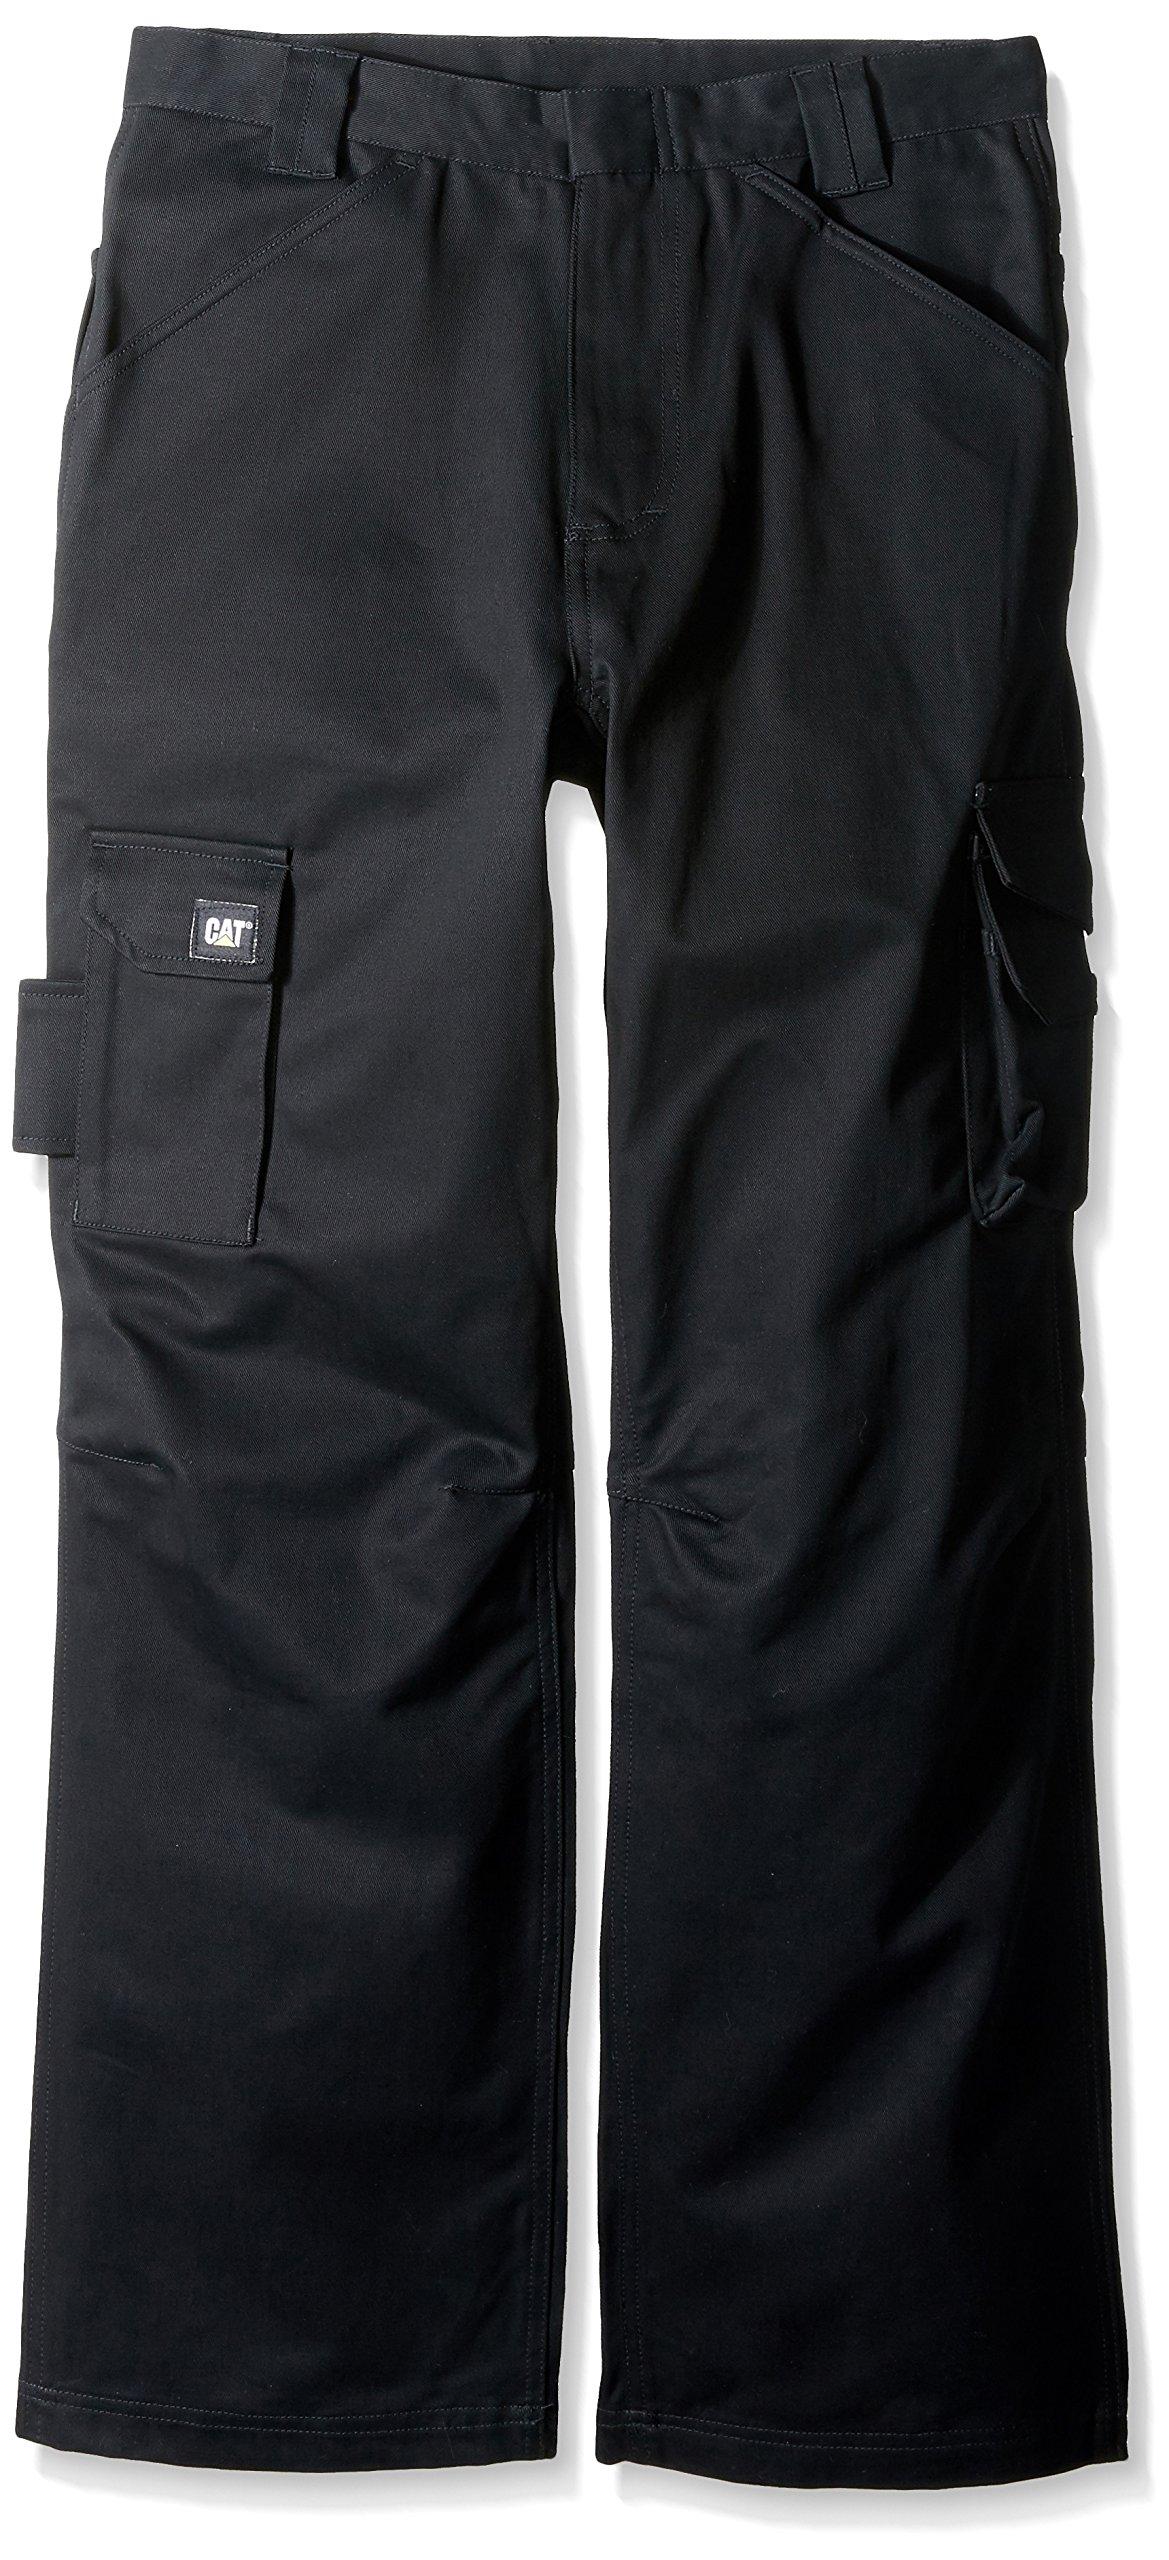 Caterpillar Flame Resistant Cargo Pant, Flame Resistant Black, 38W x 32L